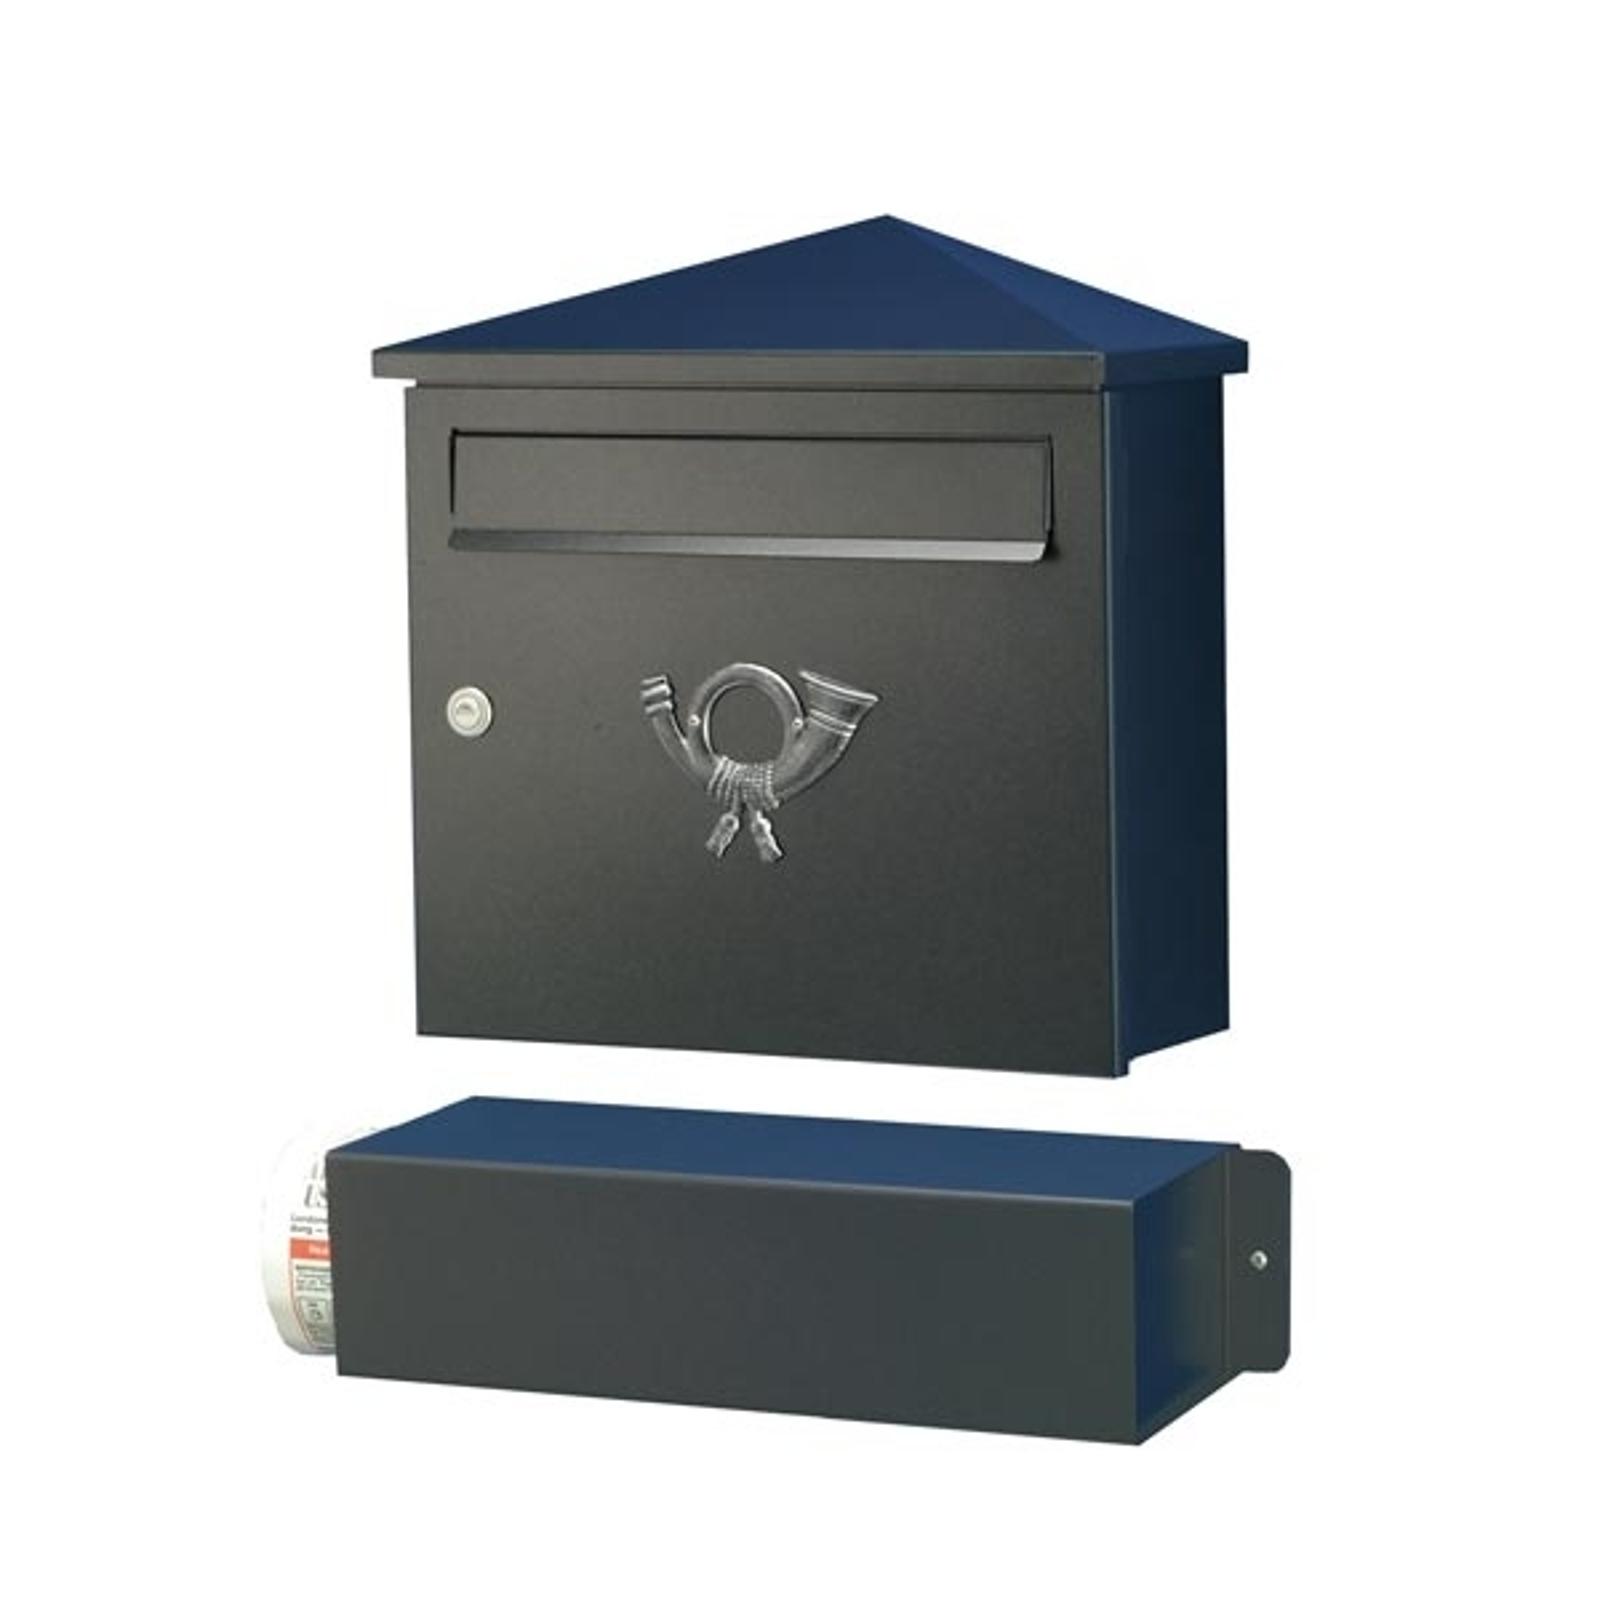 Lucio postkasse i sort